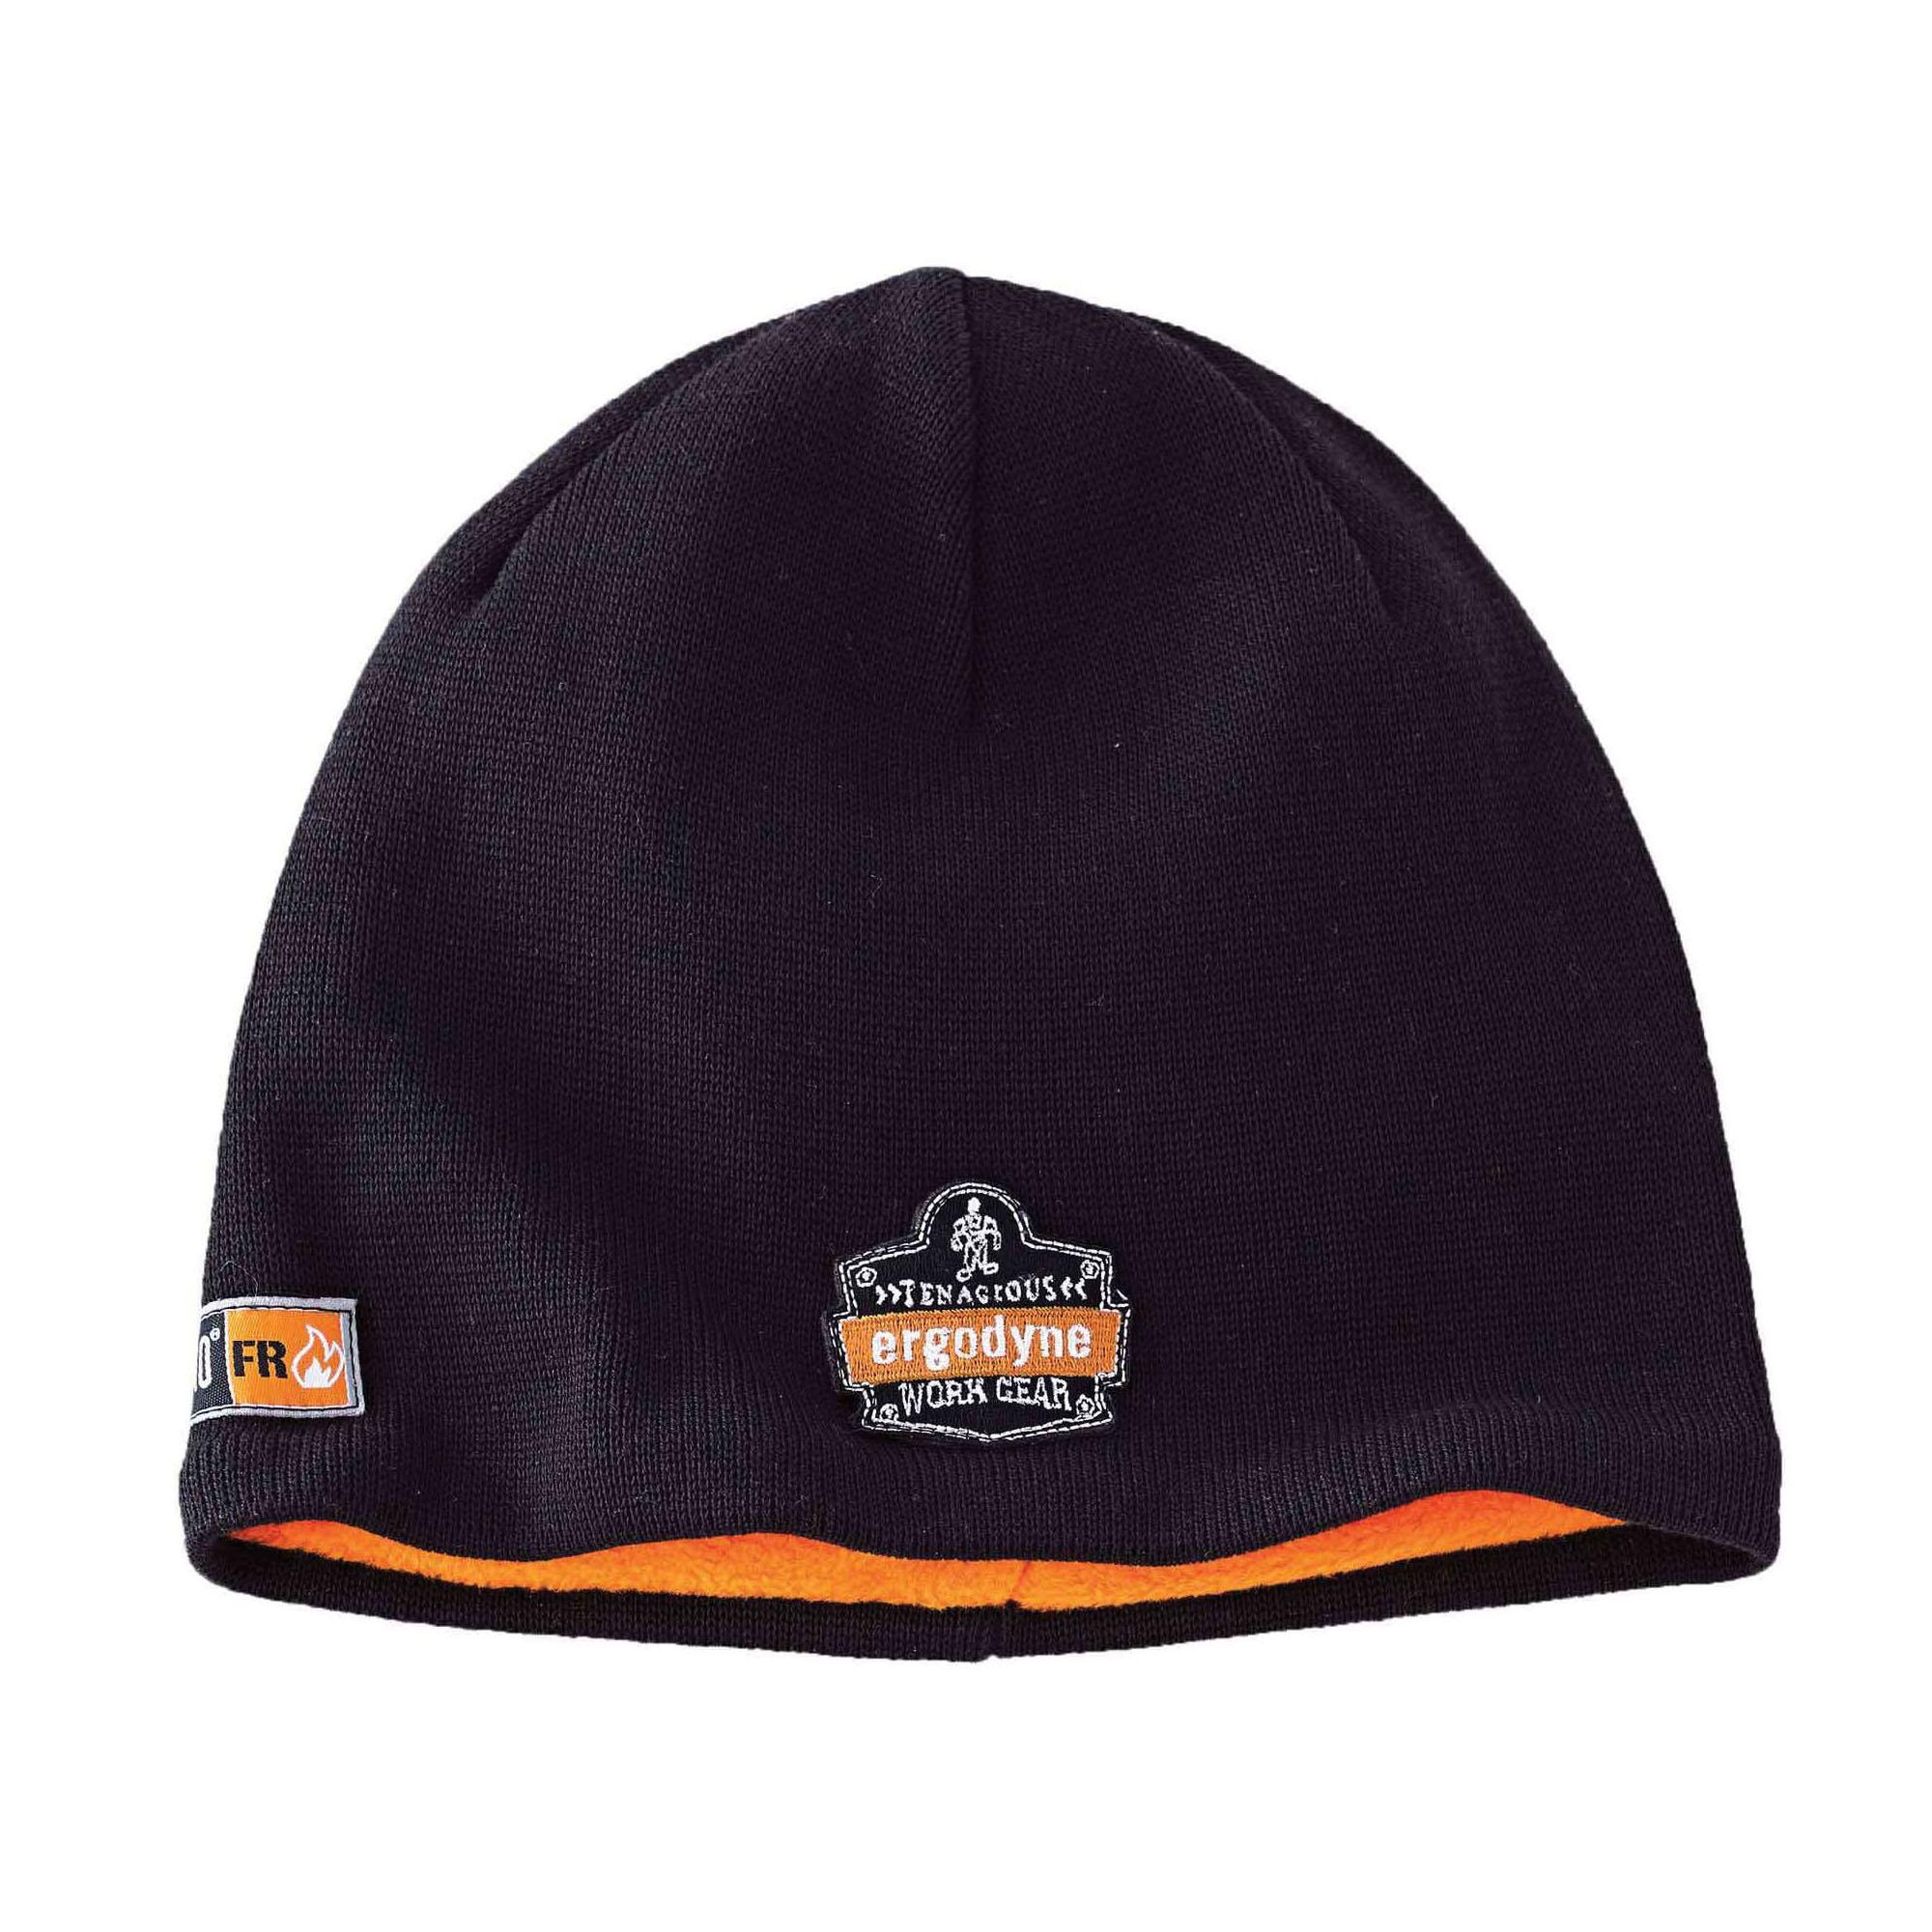 N-Ferno® 16818 Knit Cap, Universal, Black, Dralon® Acrylic